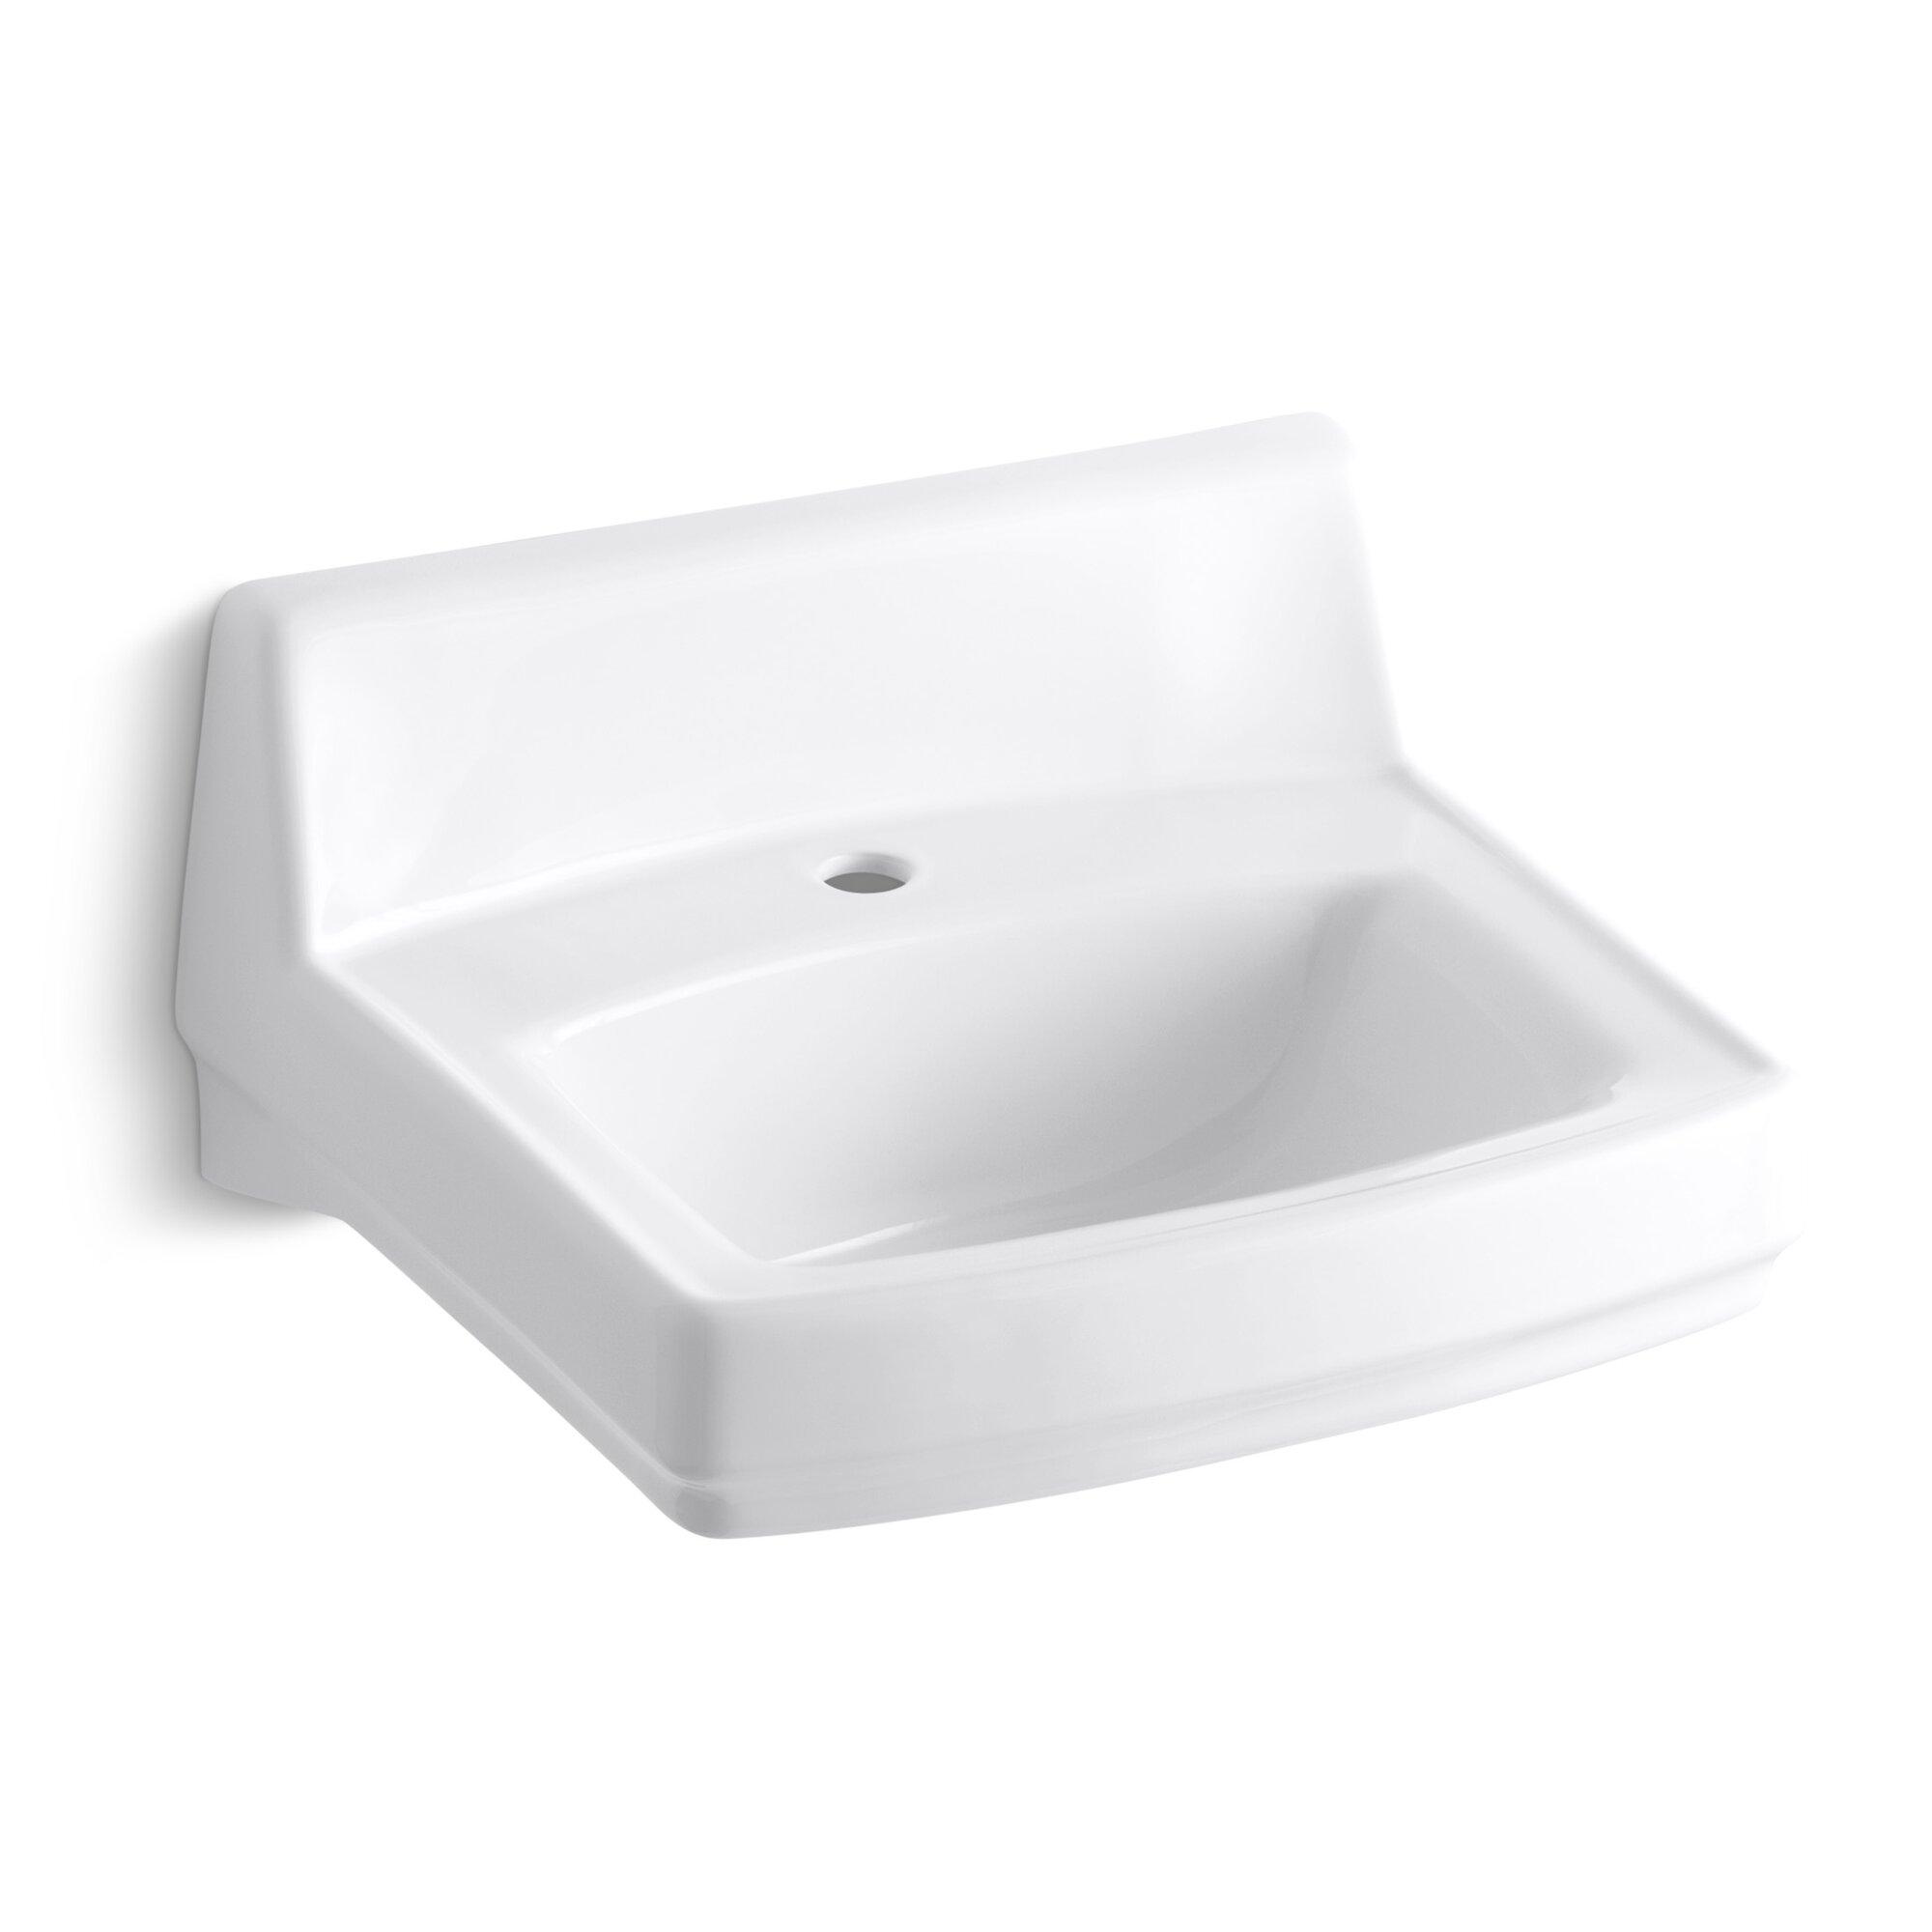 Foremost bathroom sinks - Foremost Bathroom Sinks